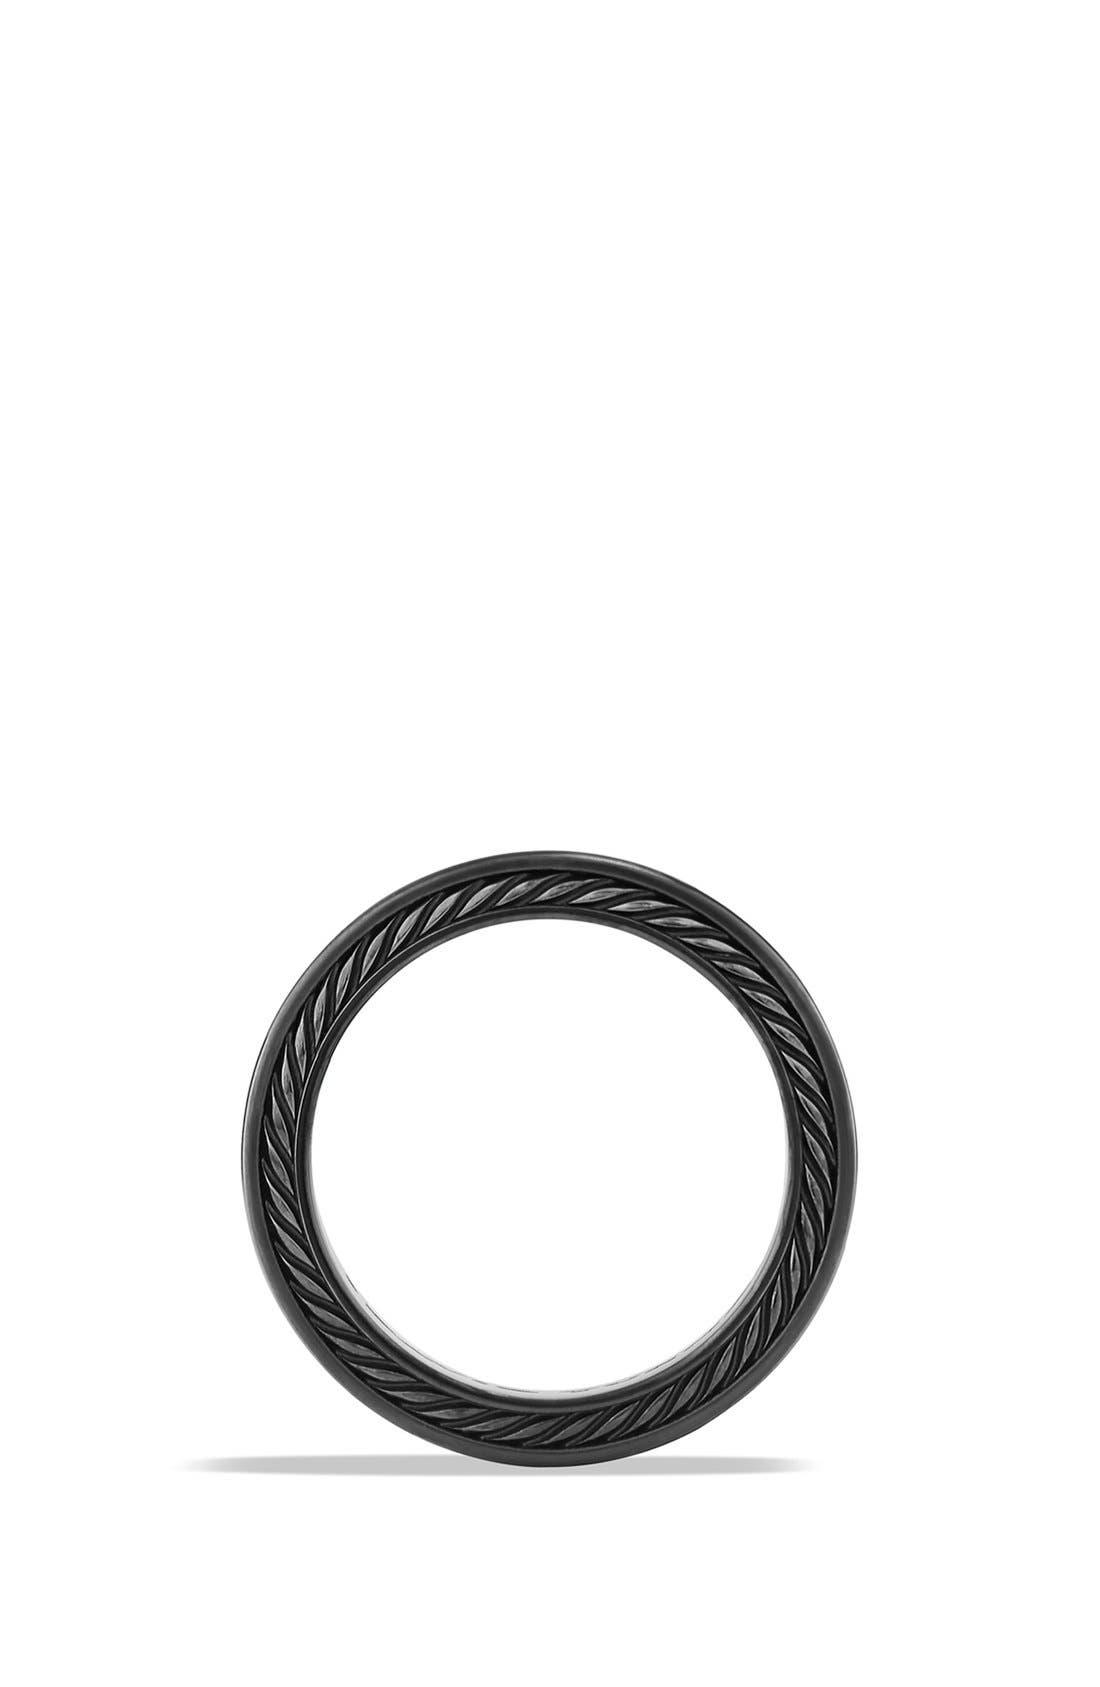 DAVID YURMAN,                             'Streamline' Pavé Three Row Ring in Black Titanium,                             Alternate thumbnail 2, color,                             GREY SAPPHIRE